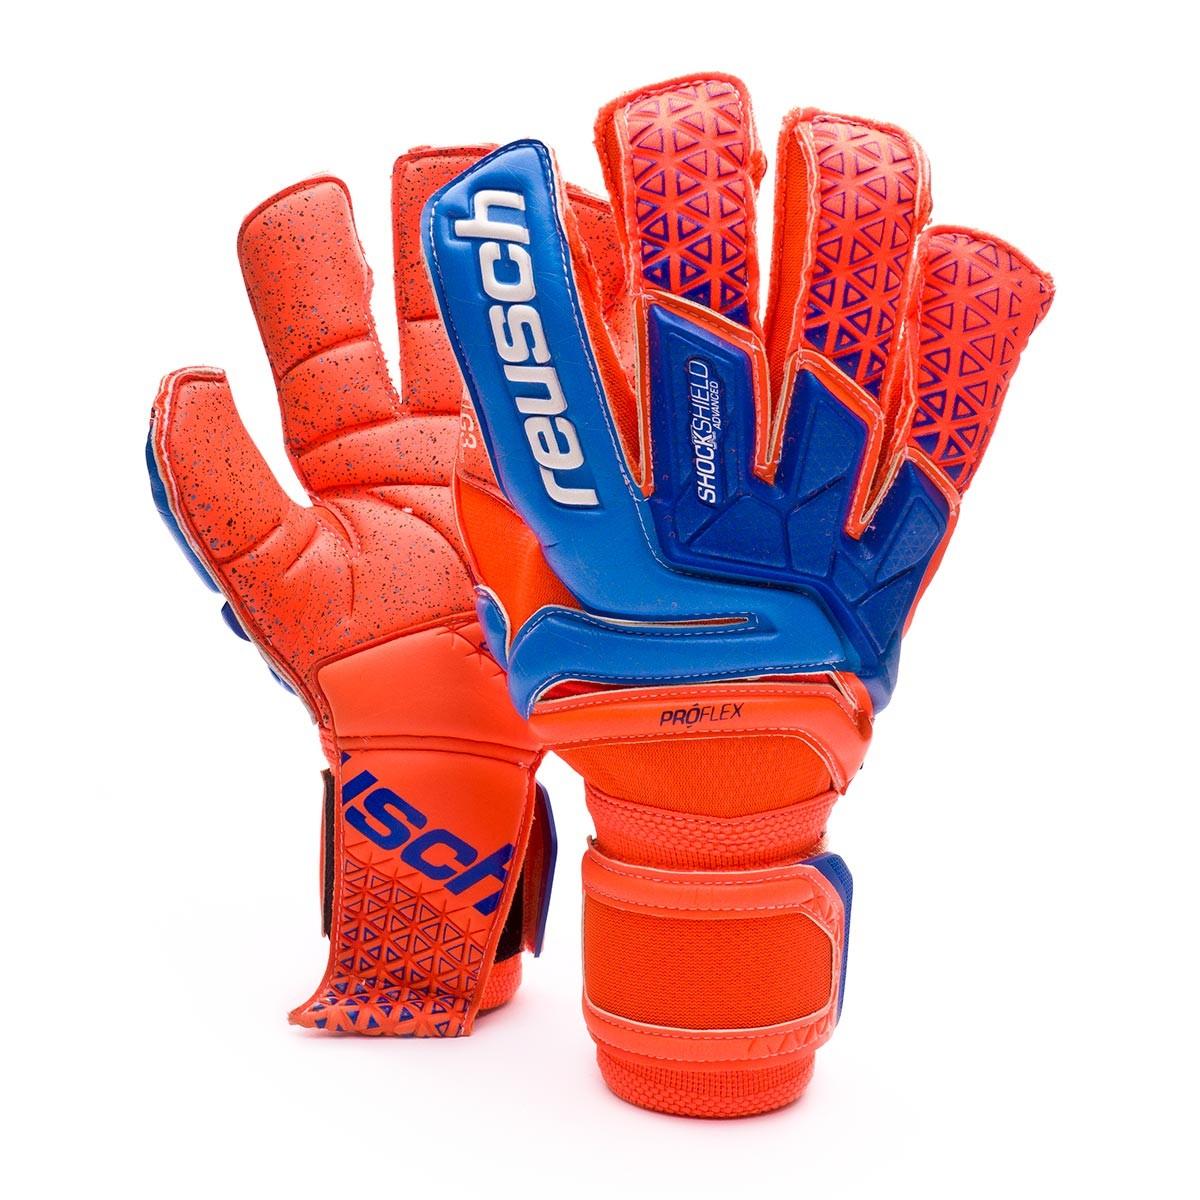 cd84f4ae5dfdb Guante de portero Reusch Prisma Supreme G3 Fusion Shocking  orange-Blue-Shocking orange - Tienda de fútbol Fútbol Emotion